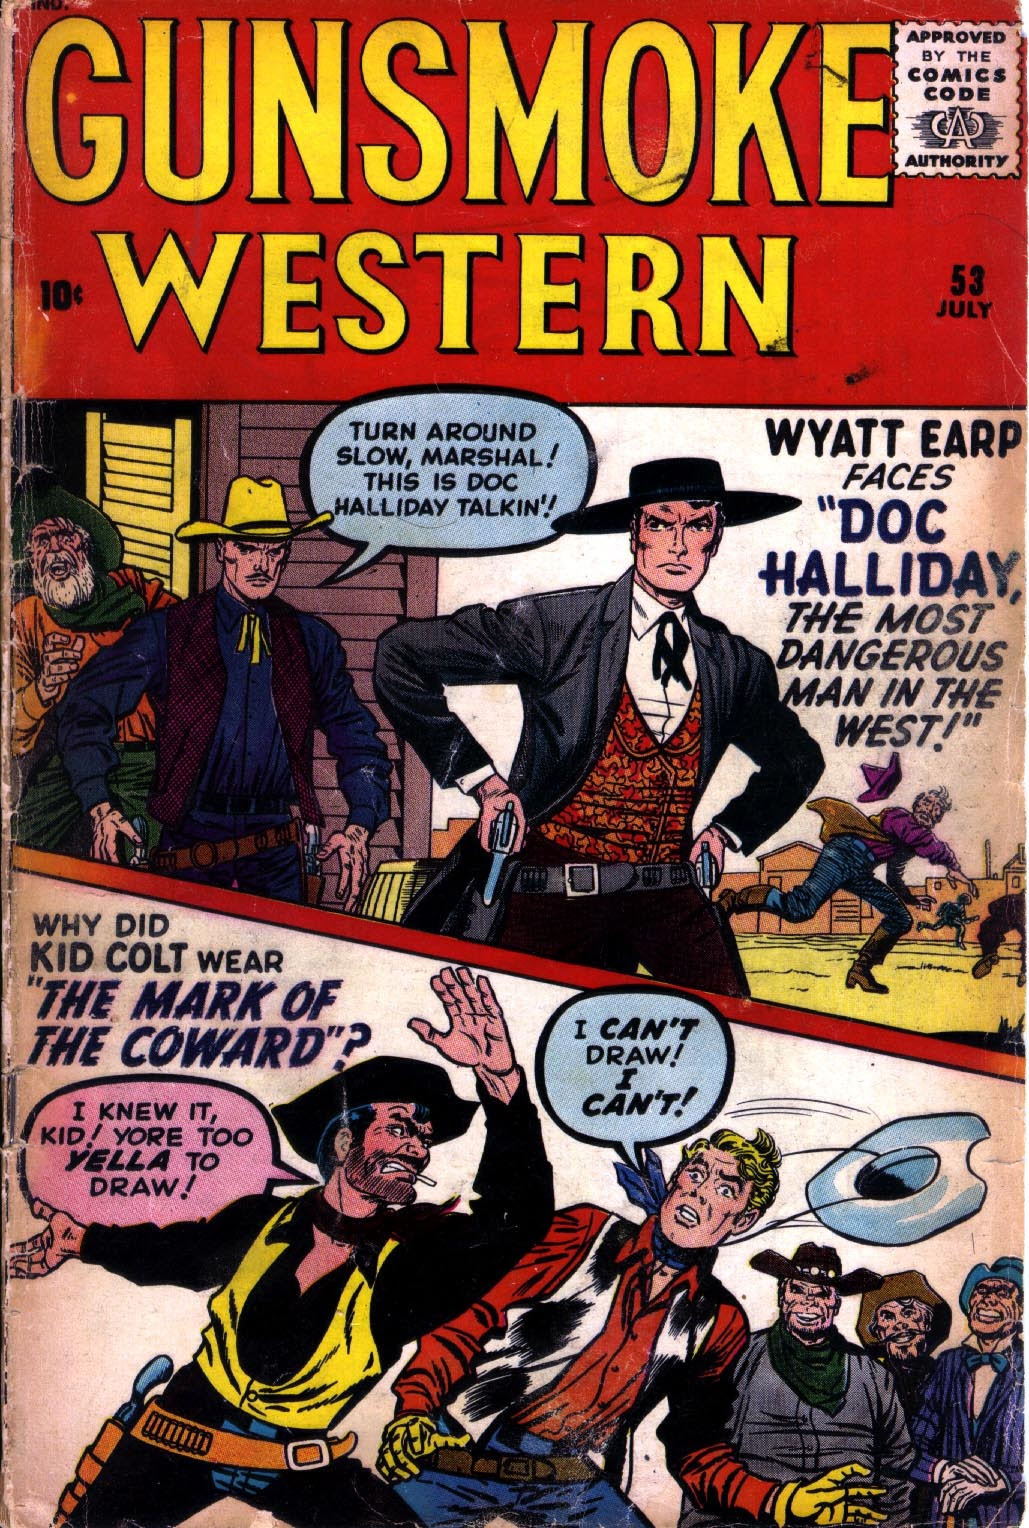 Gunsmoke Western 53 Page 1